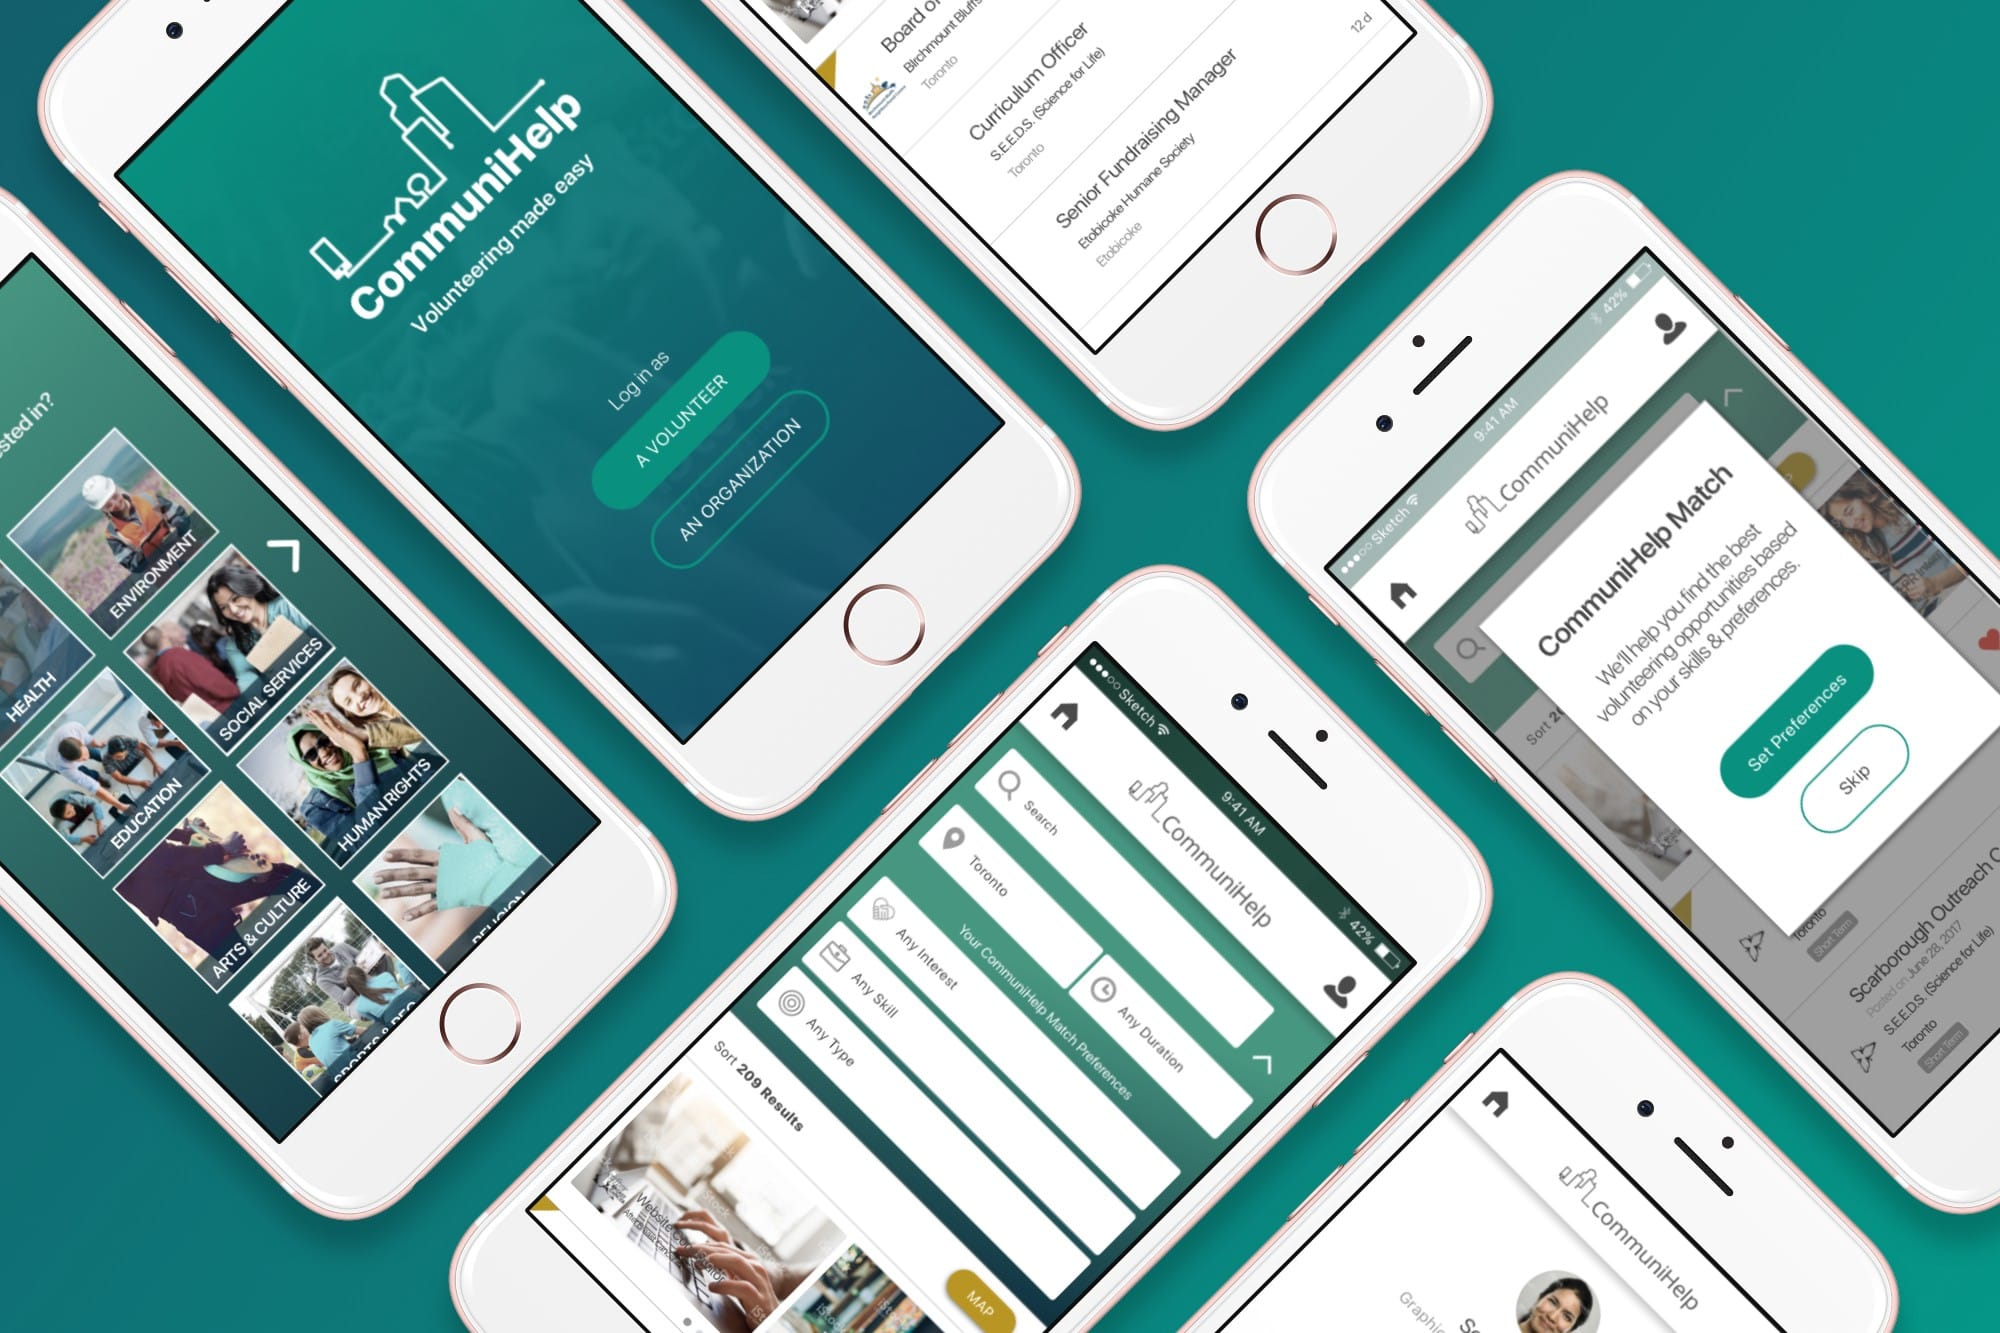 App Ideas for Non-Profit